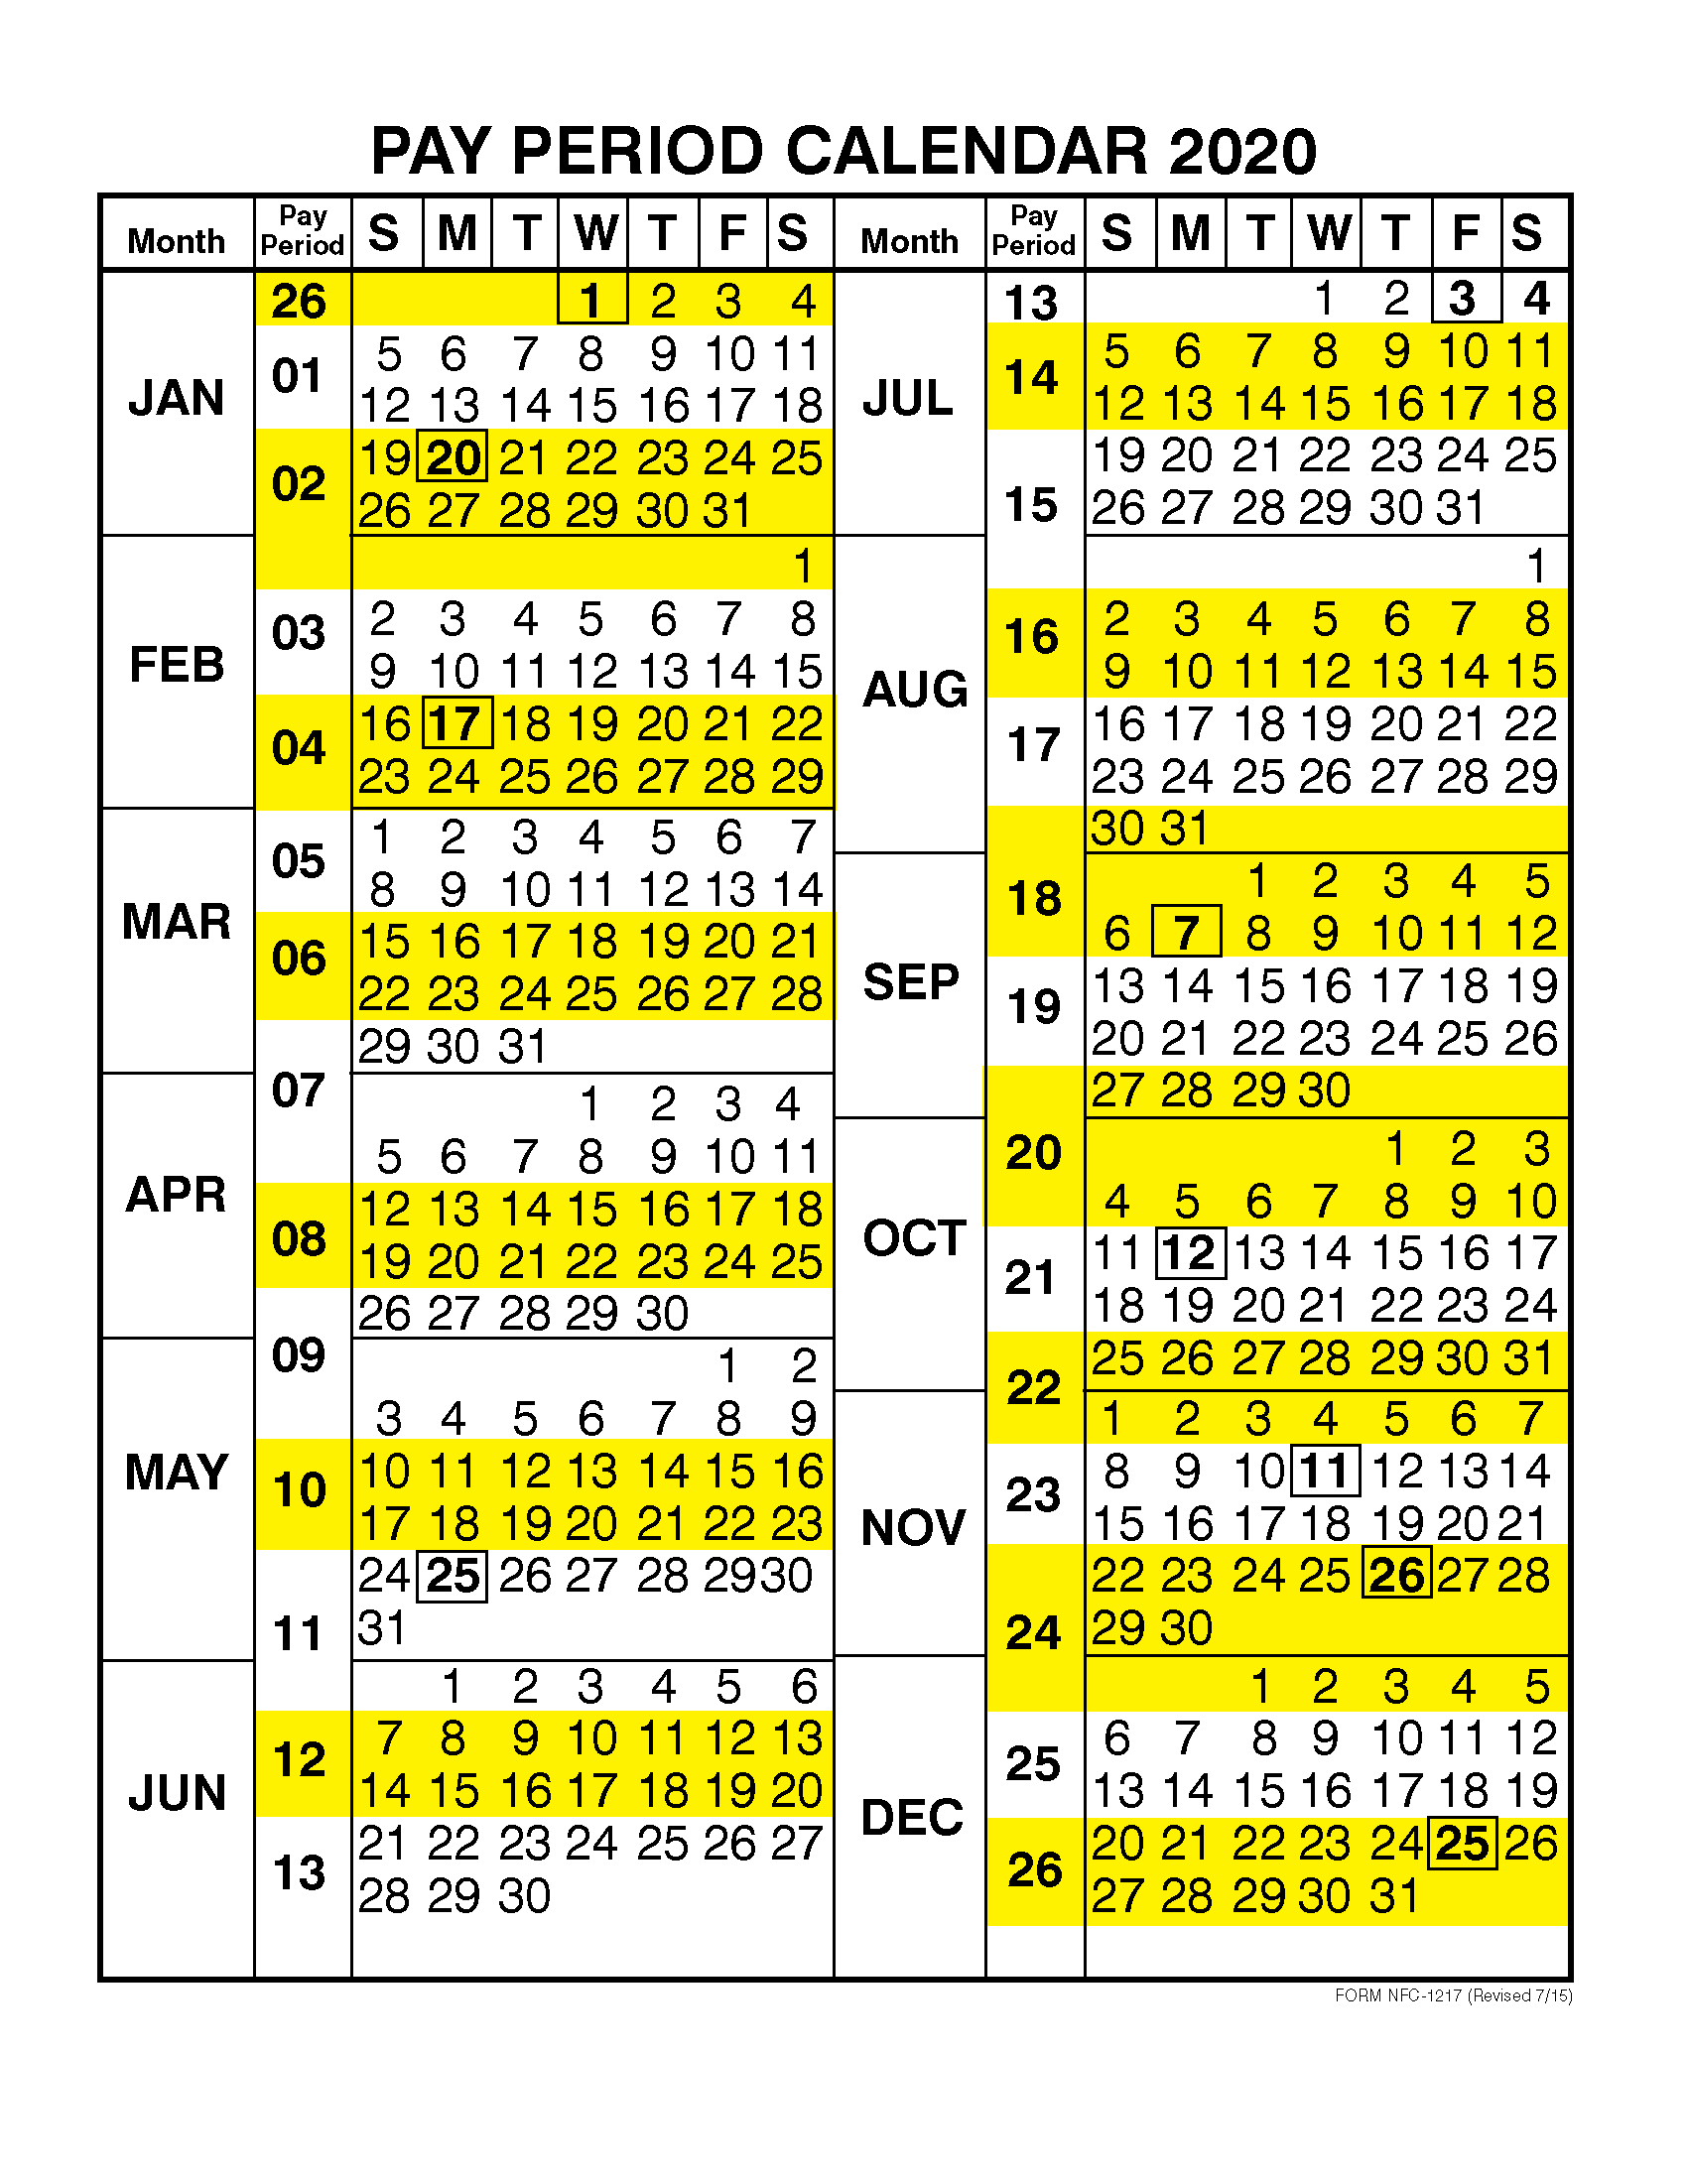 Ca State Paydays 2021